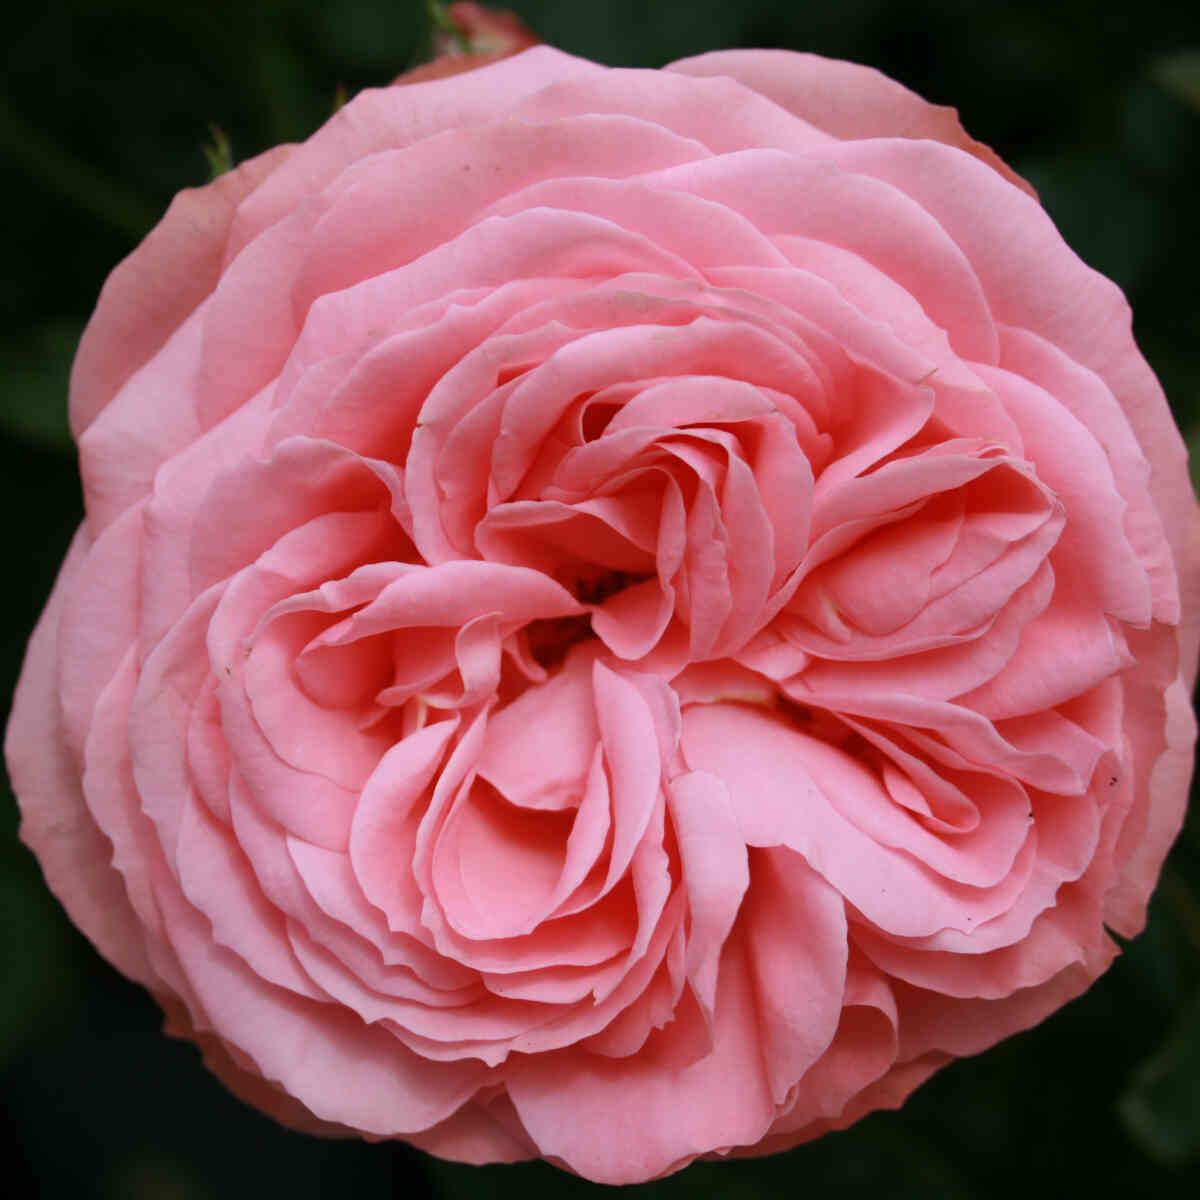 Rose 'What a wonderful World'